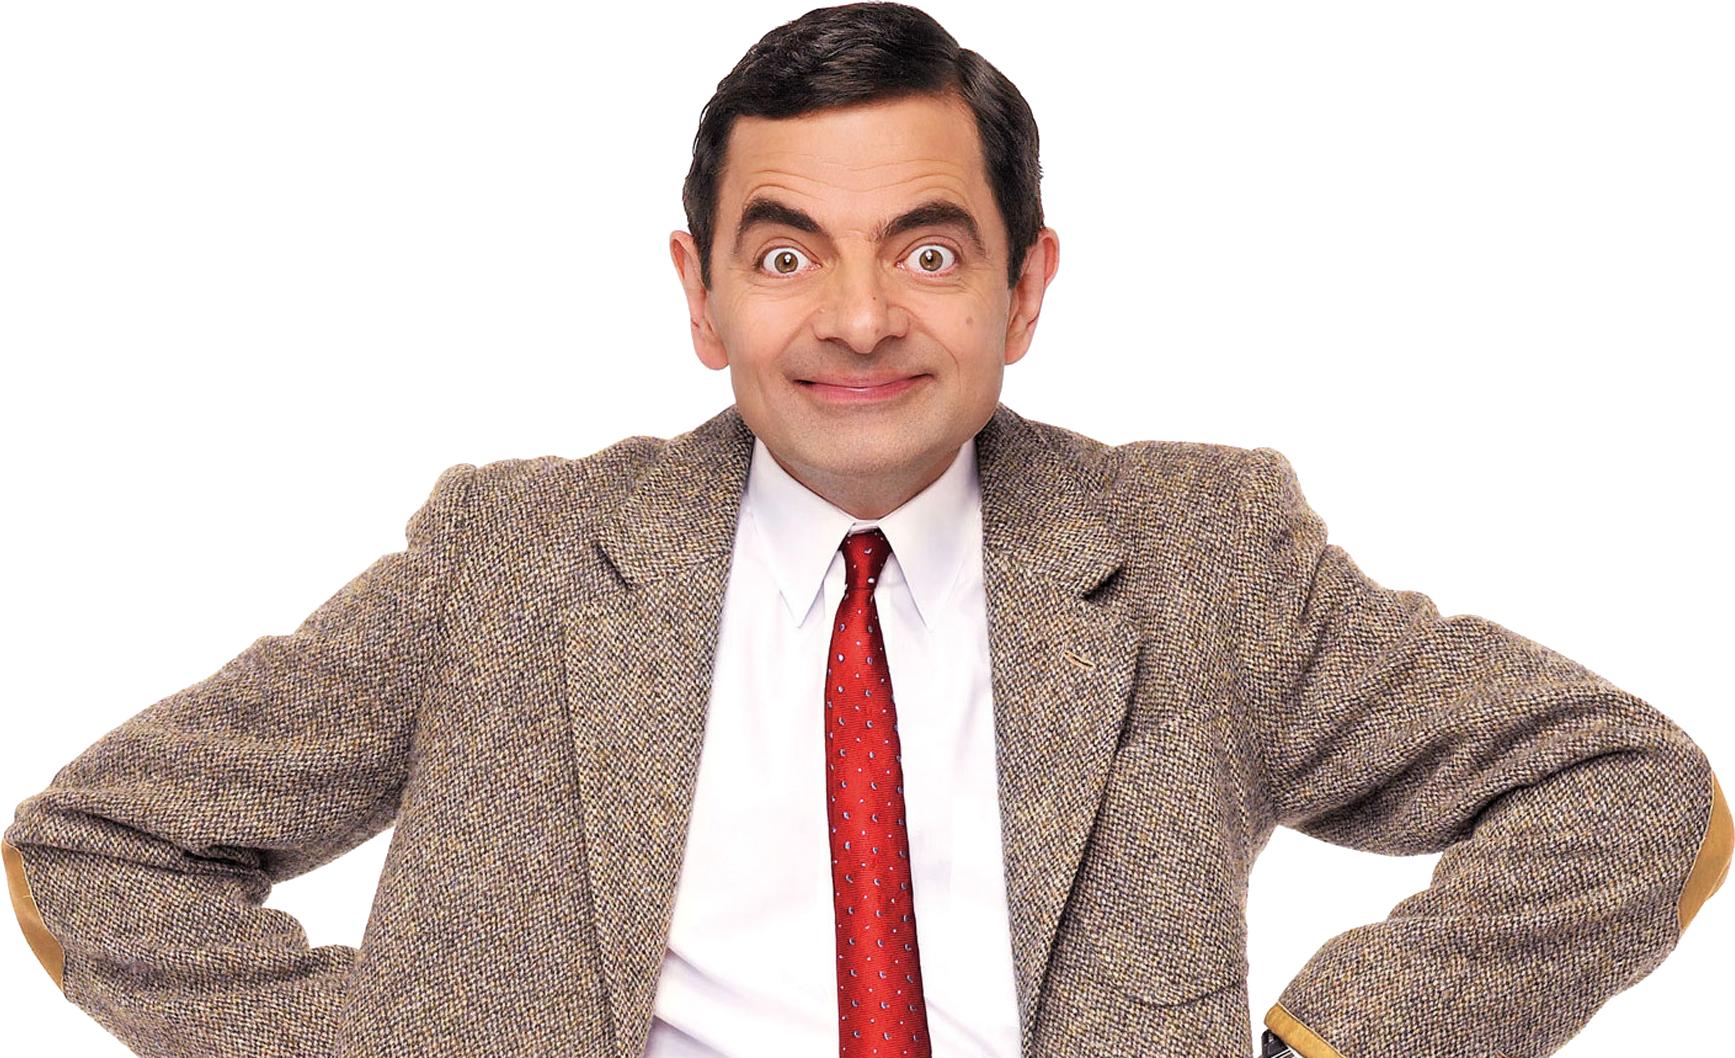 Bean rowan atkinson png. Mr clipart suited man